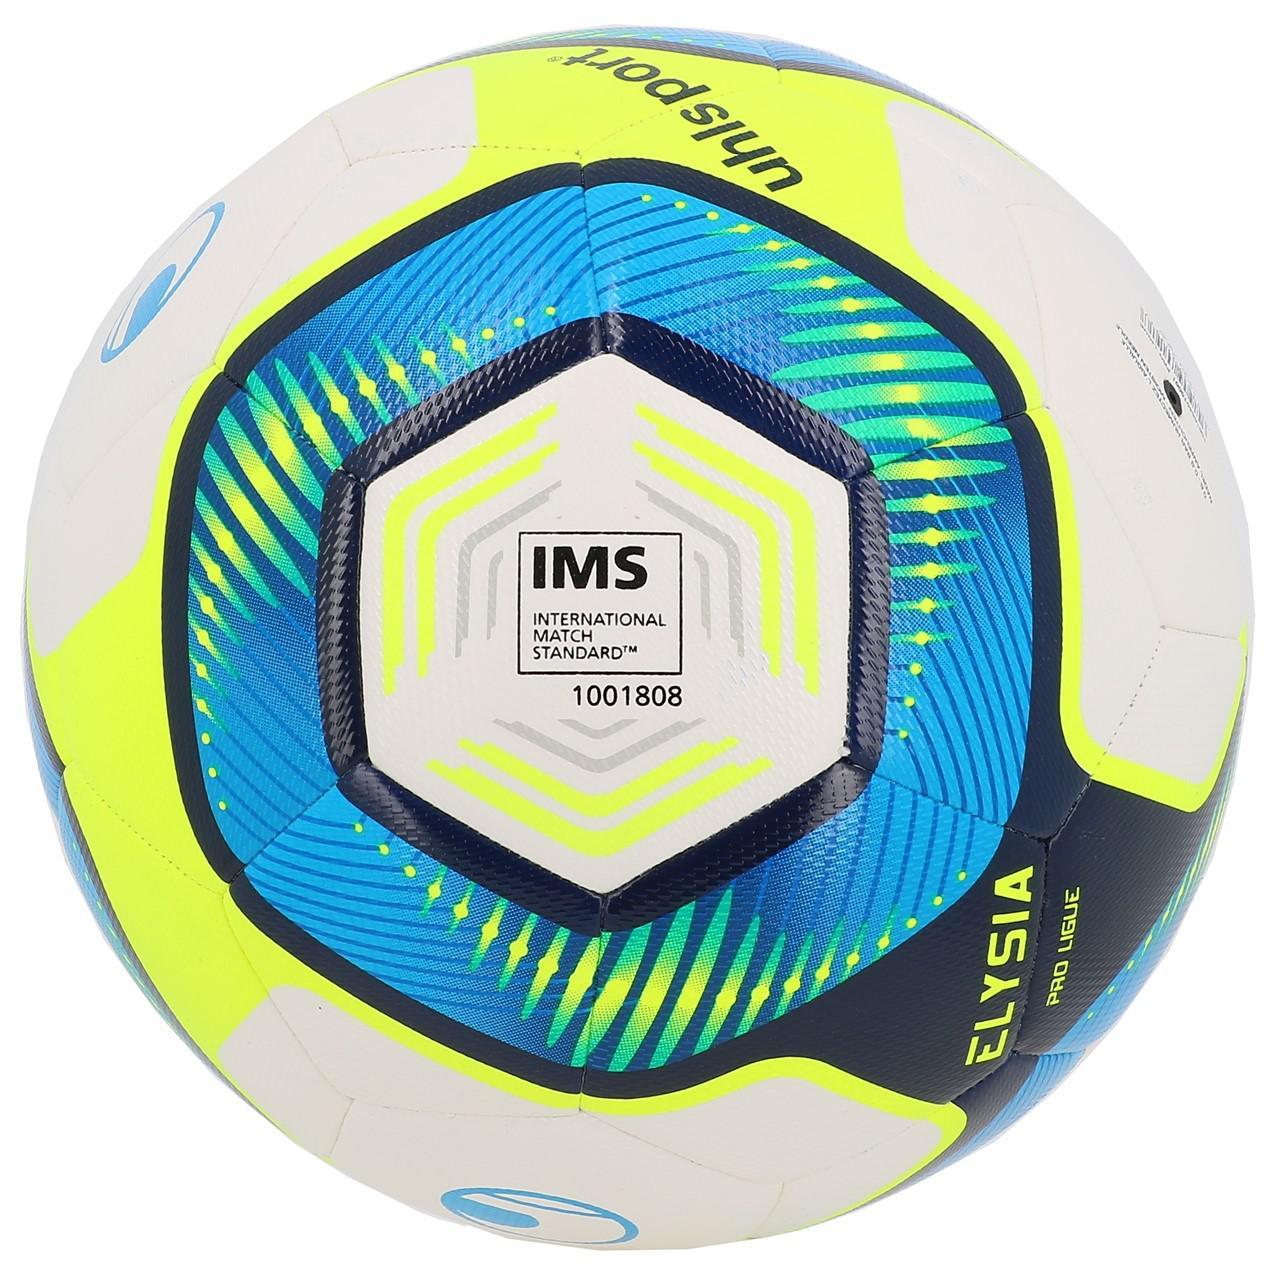 Ball-Football-Leisure-Uhlsport-League-1-Proligue-t5-White-50009-New thumbnail 2